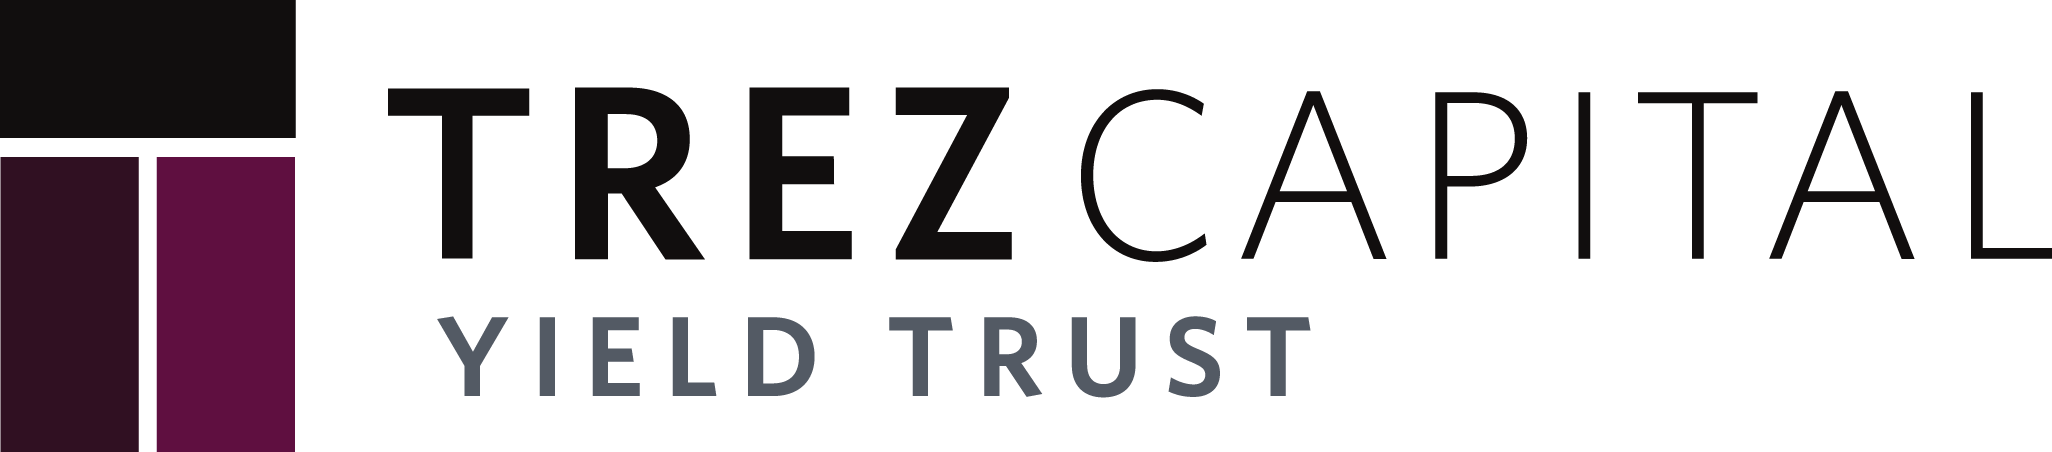 Yield Trust